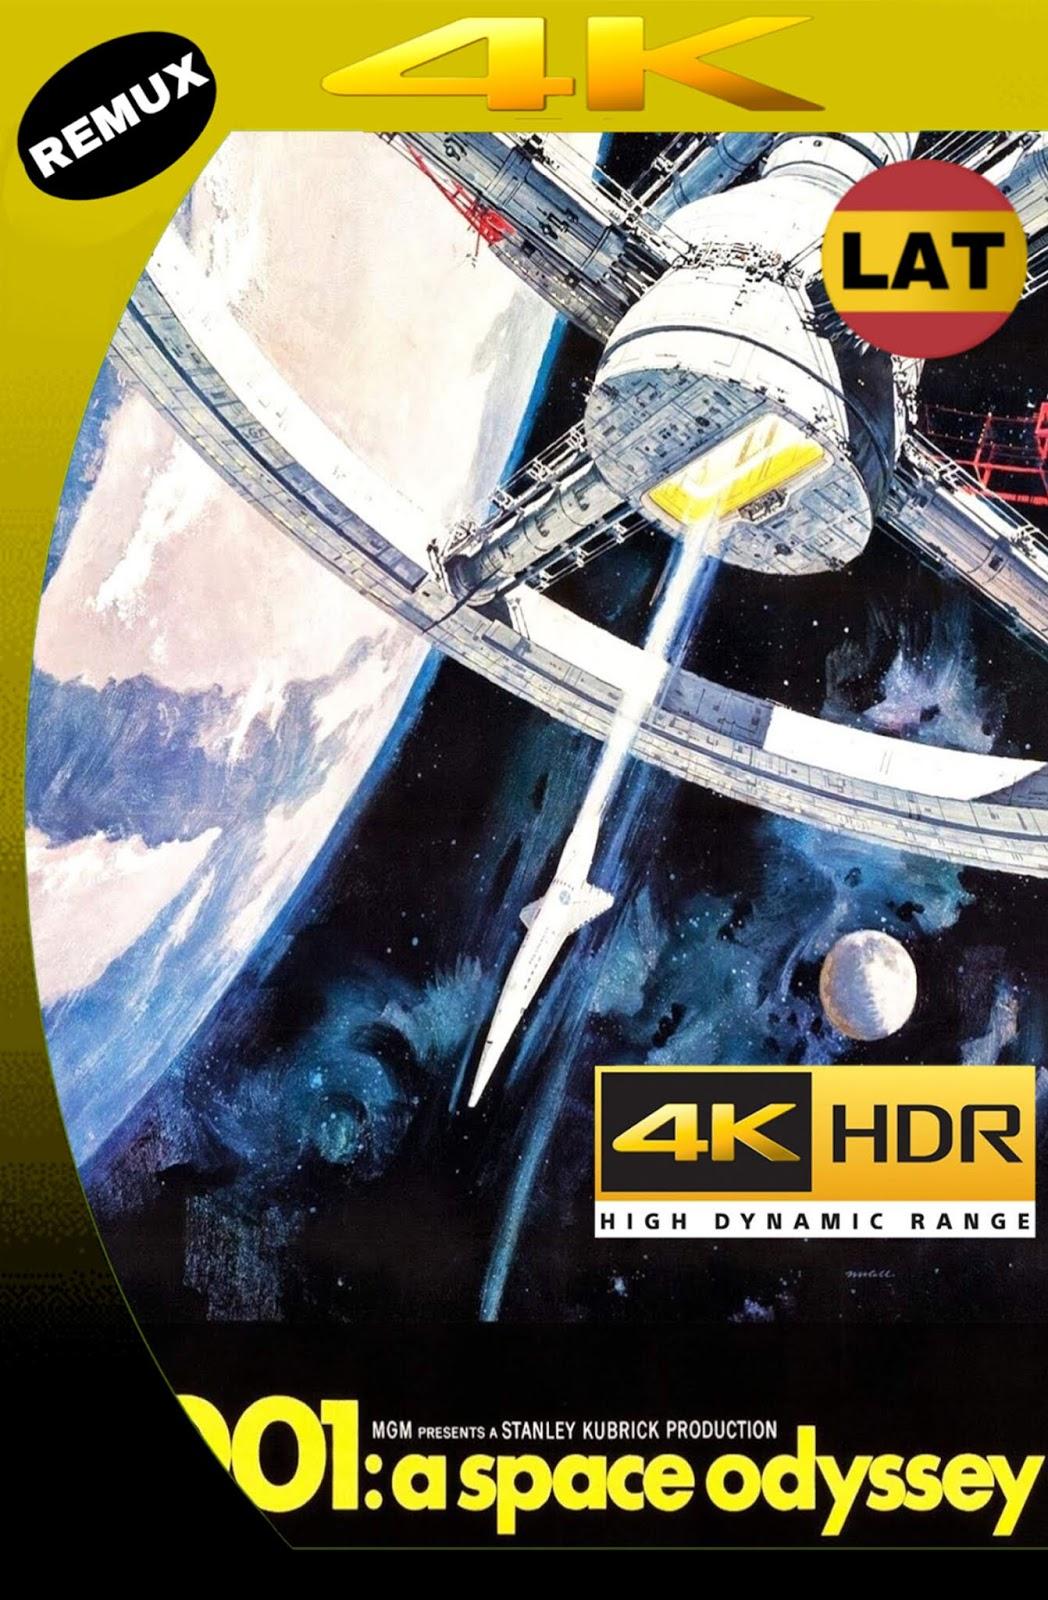 2001: ODISEA DEL ESPACIO 1968 LAT-ING UHD 4K HDR BDREMUX 2160P MKV